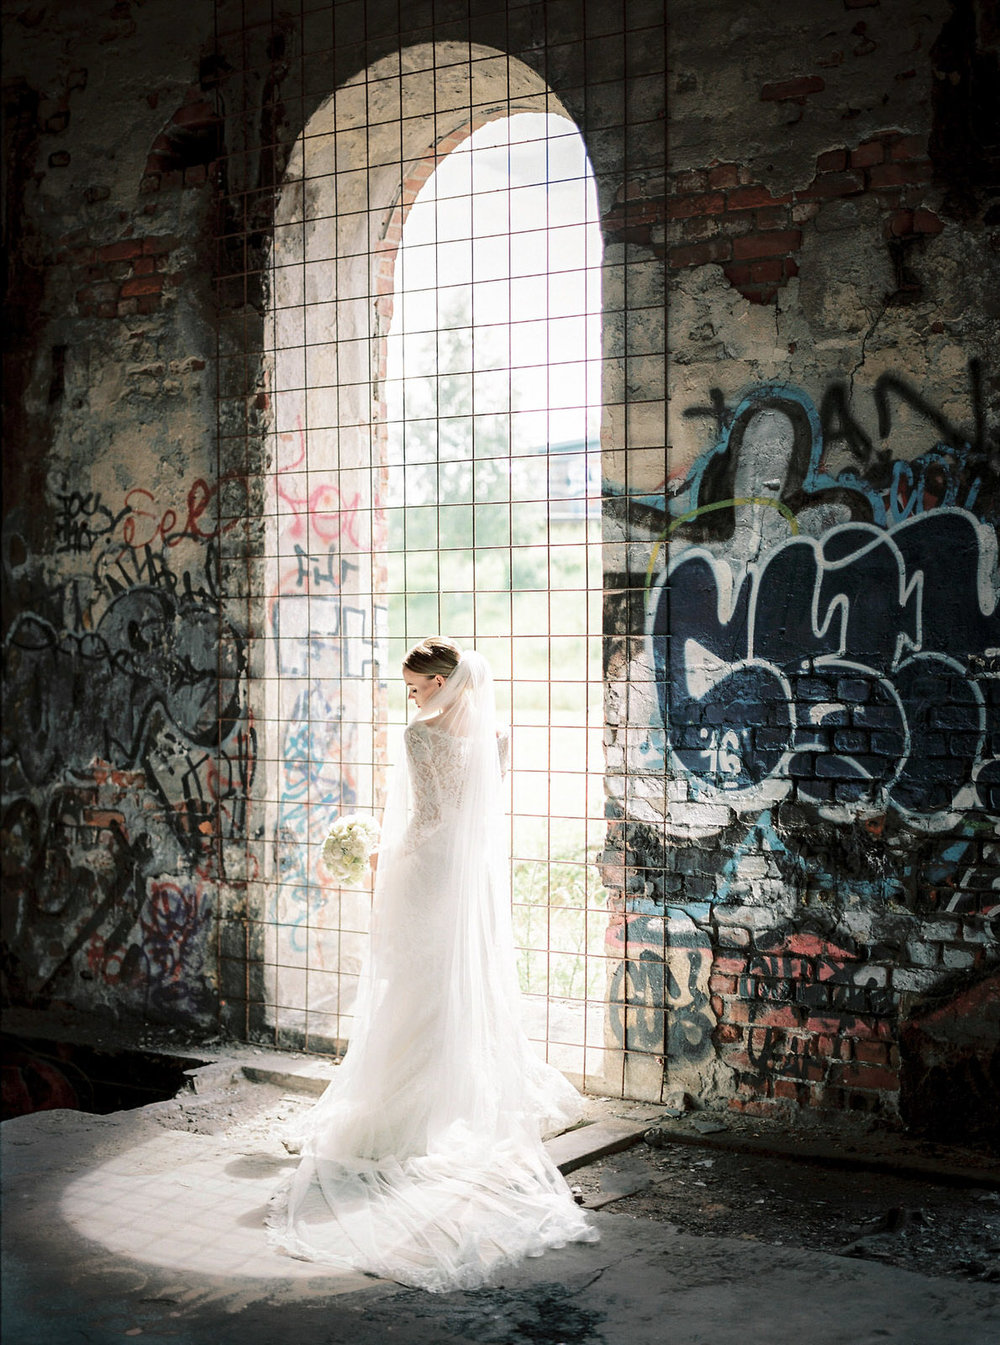 Fotograf: Torstein Gamst www.pixlight.no